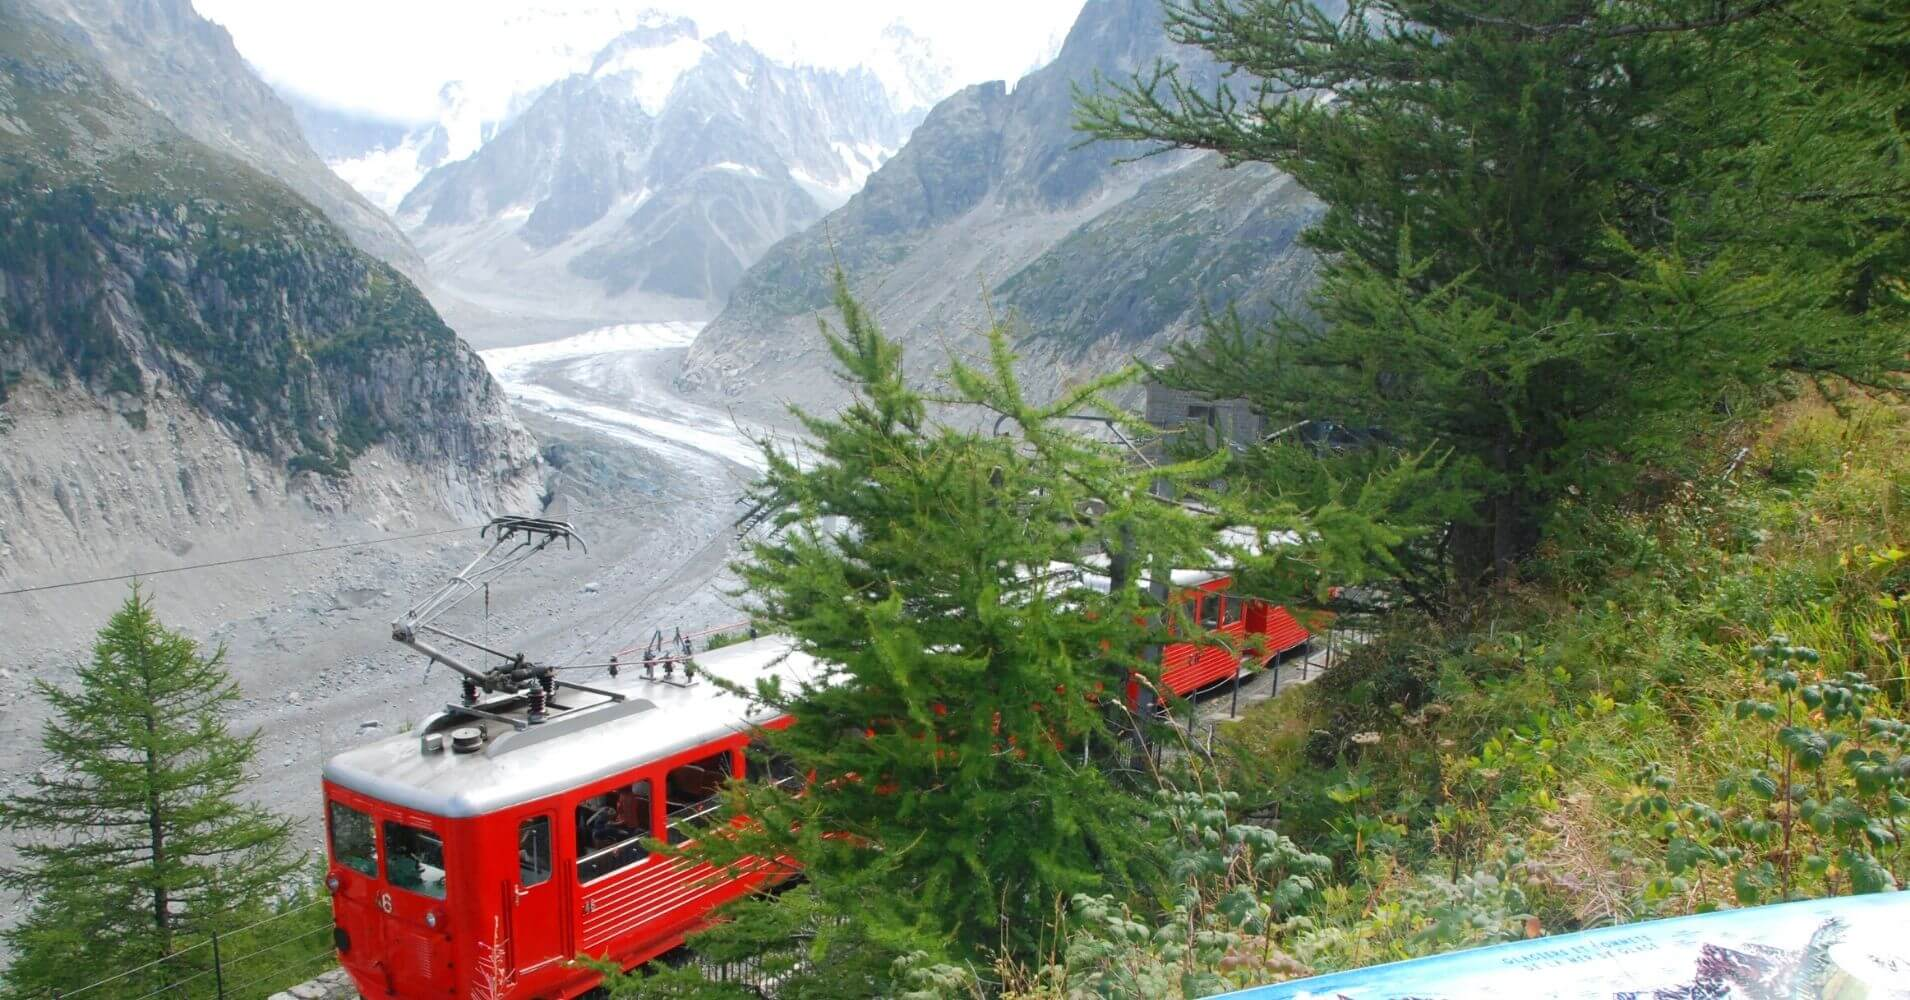 Ferrocarril de Montenvers. Mer de Glace. Chamonix, Alta Saboya. Auvernia-Ródano-Alpes. Francia.